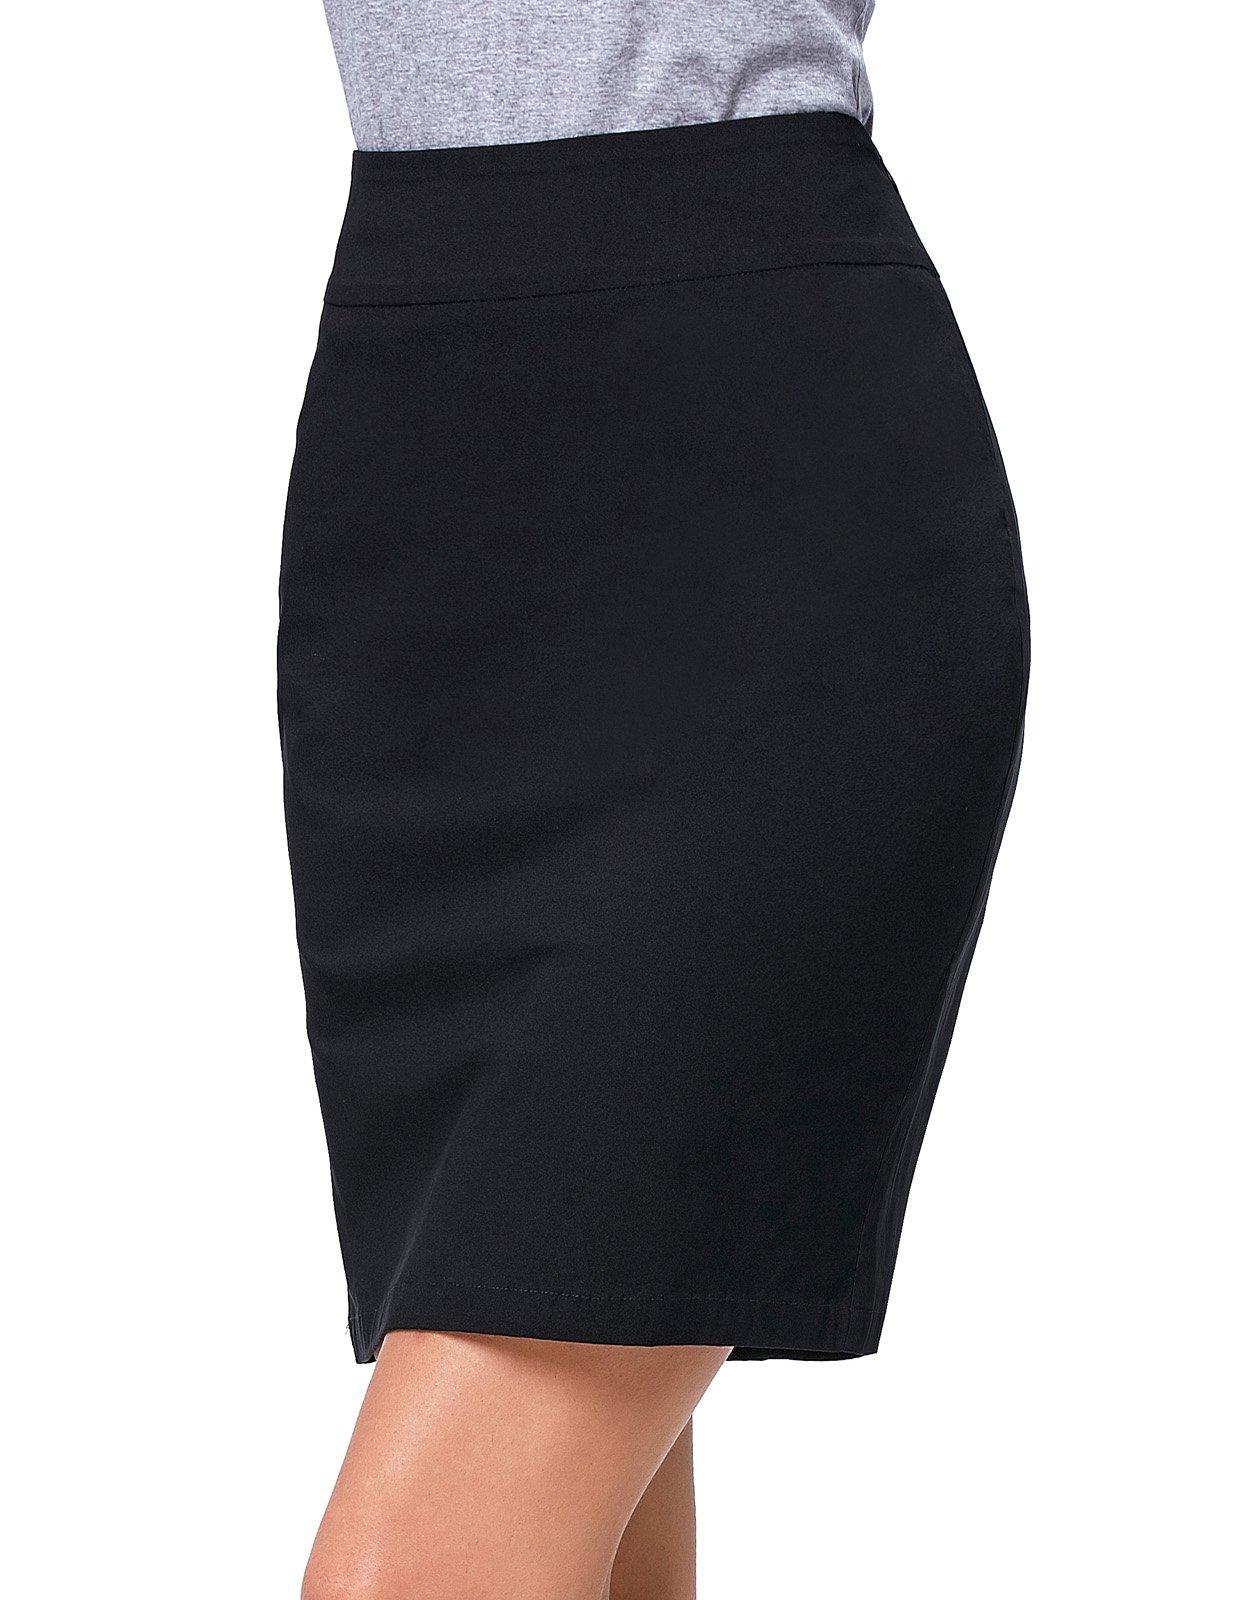 Kate Kasin Elastic Office Wear Above Knee Women Pencil Skirt Size S KK276-1